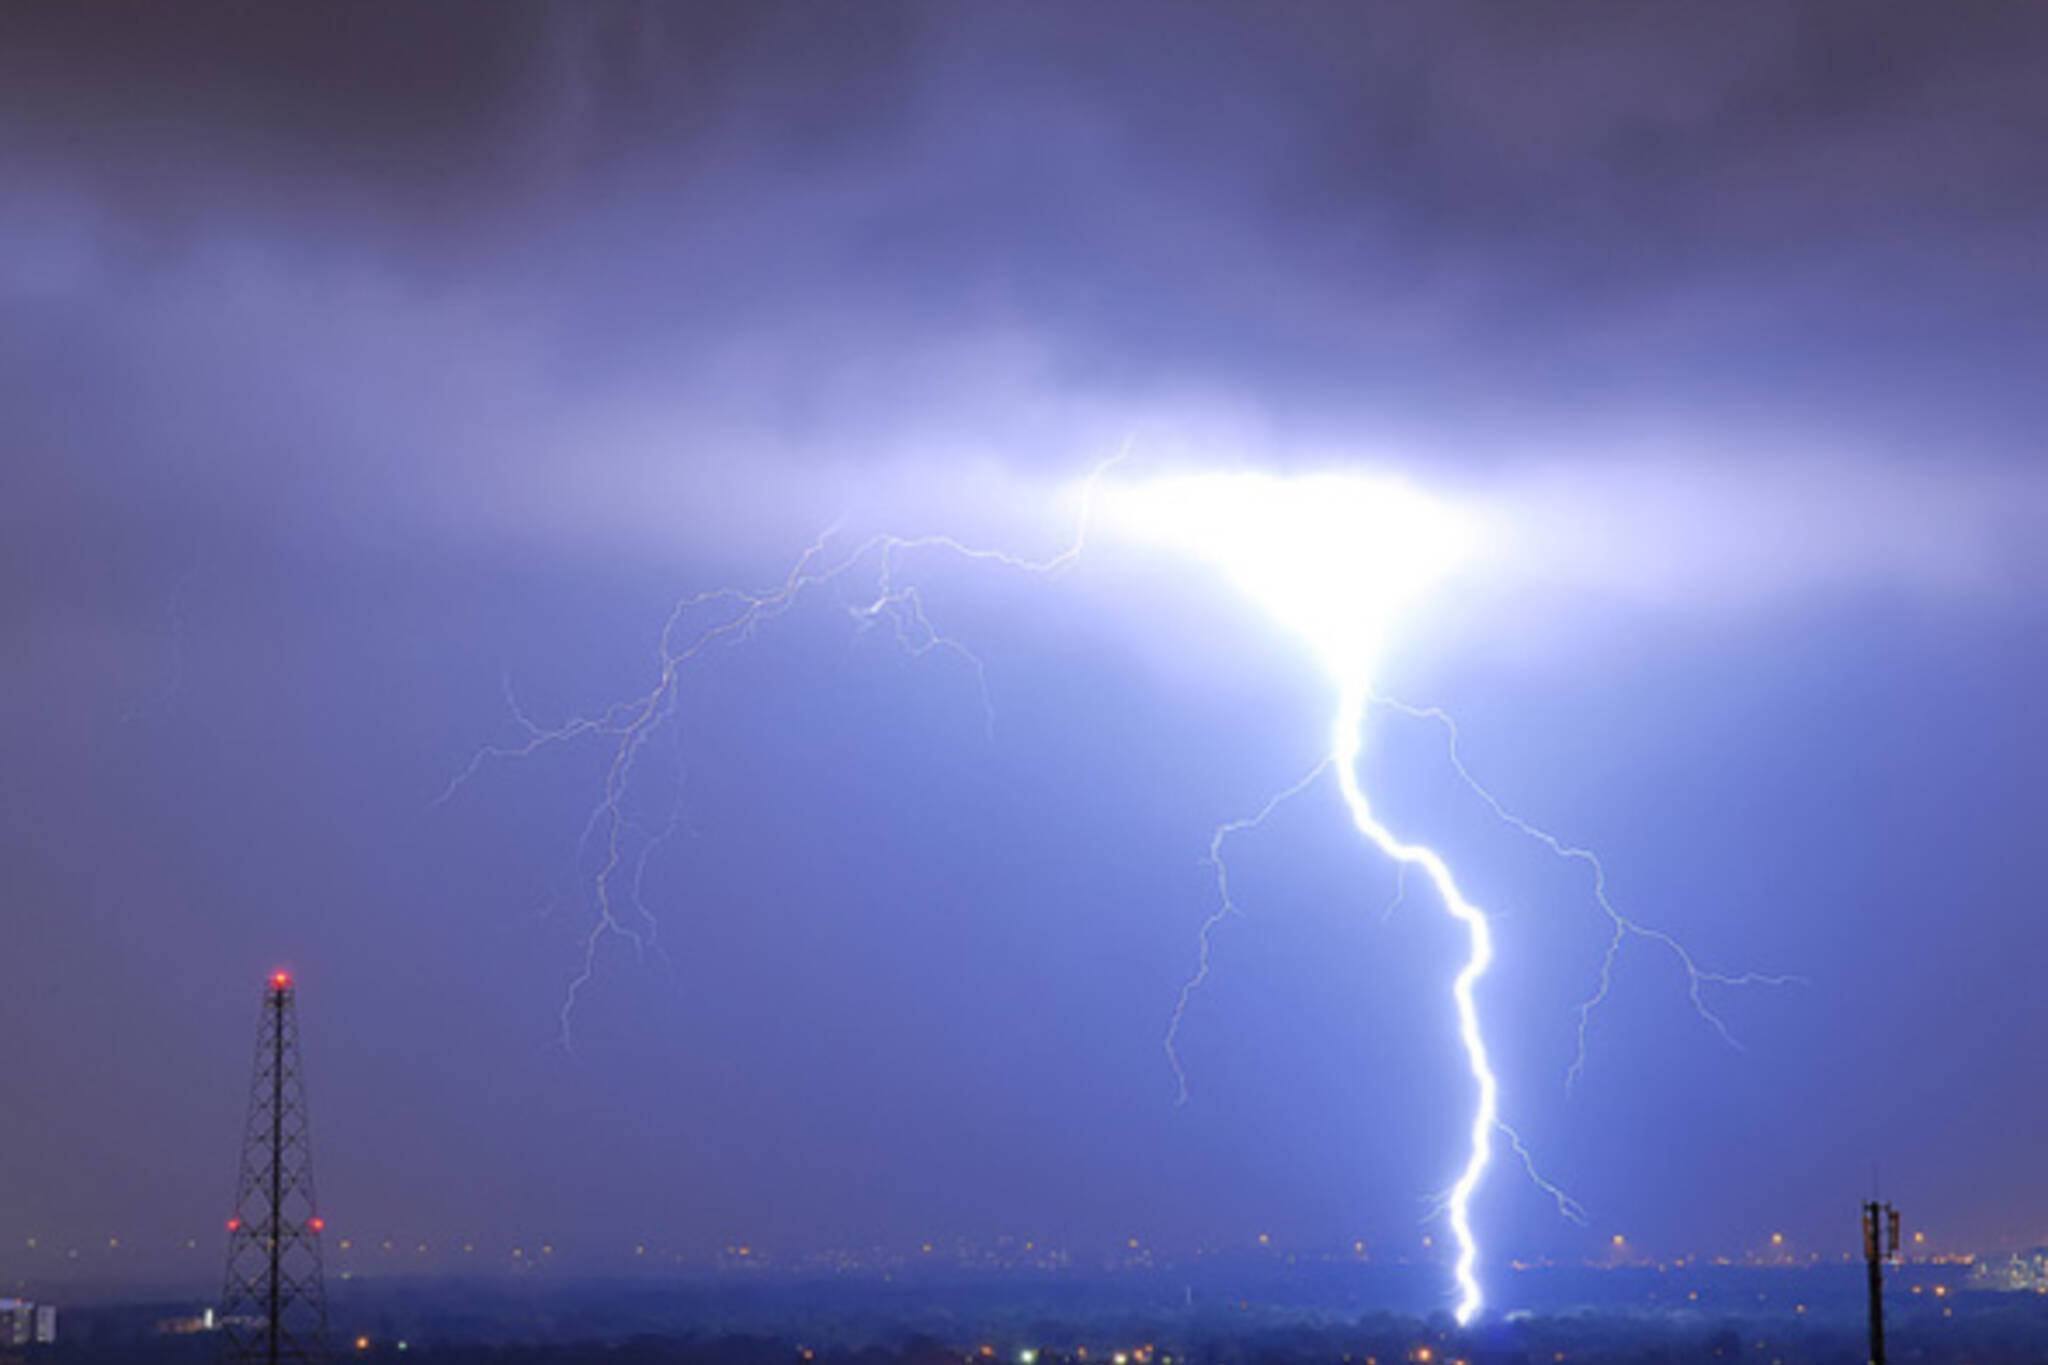 Thunderstorm toronto